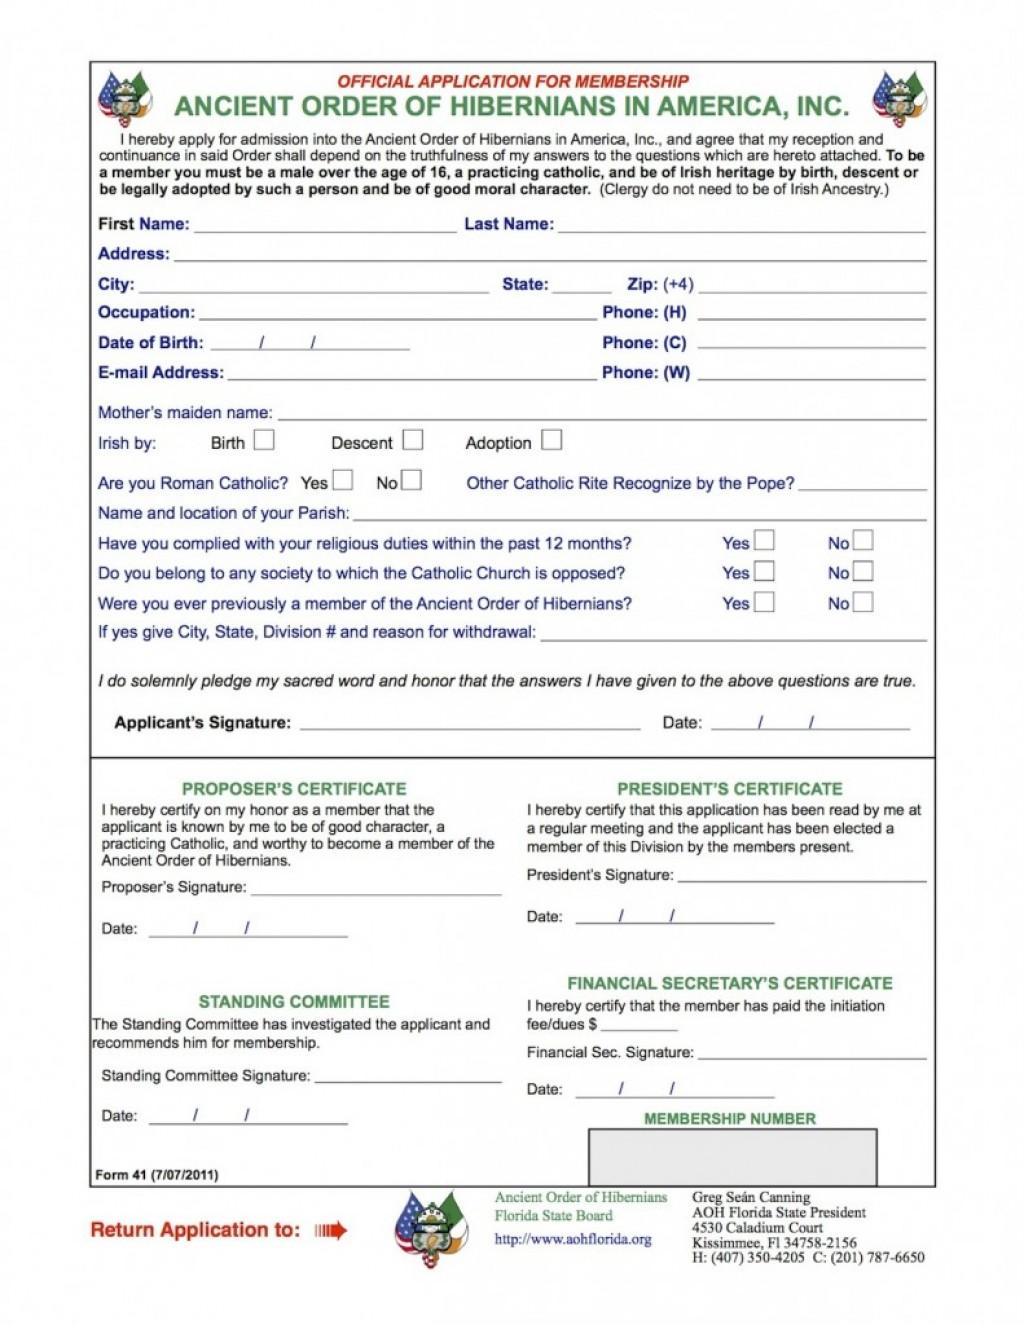 008 Florida State Admissions Essay Application University Admission Sample U Example Remarkable Fsu Large